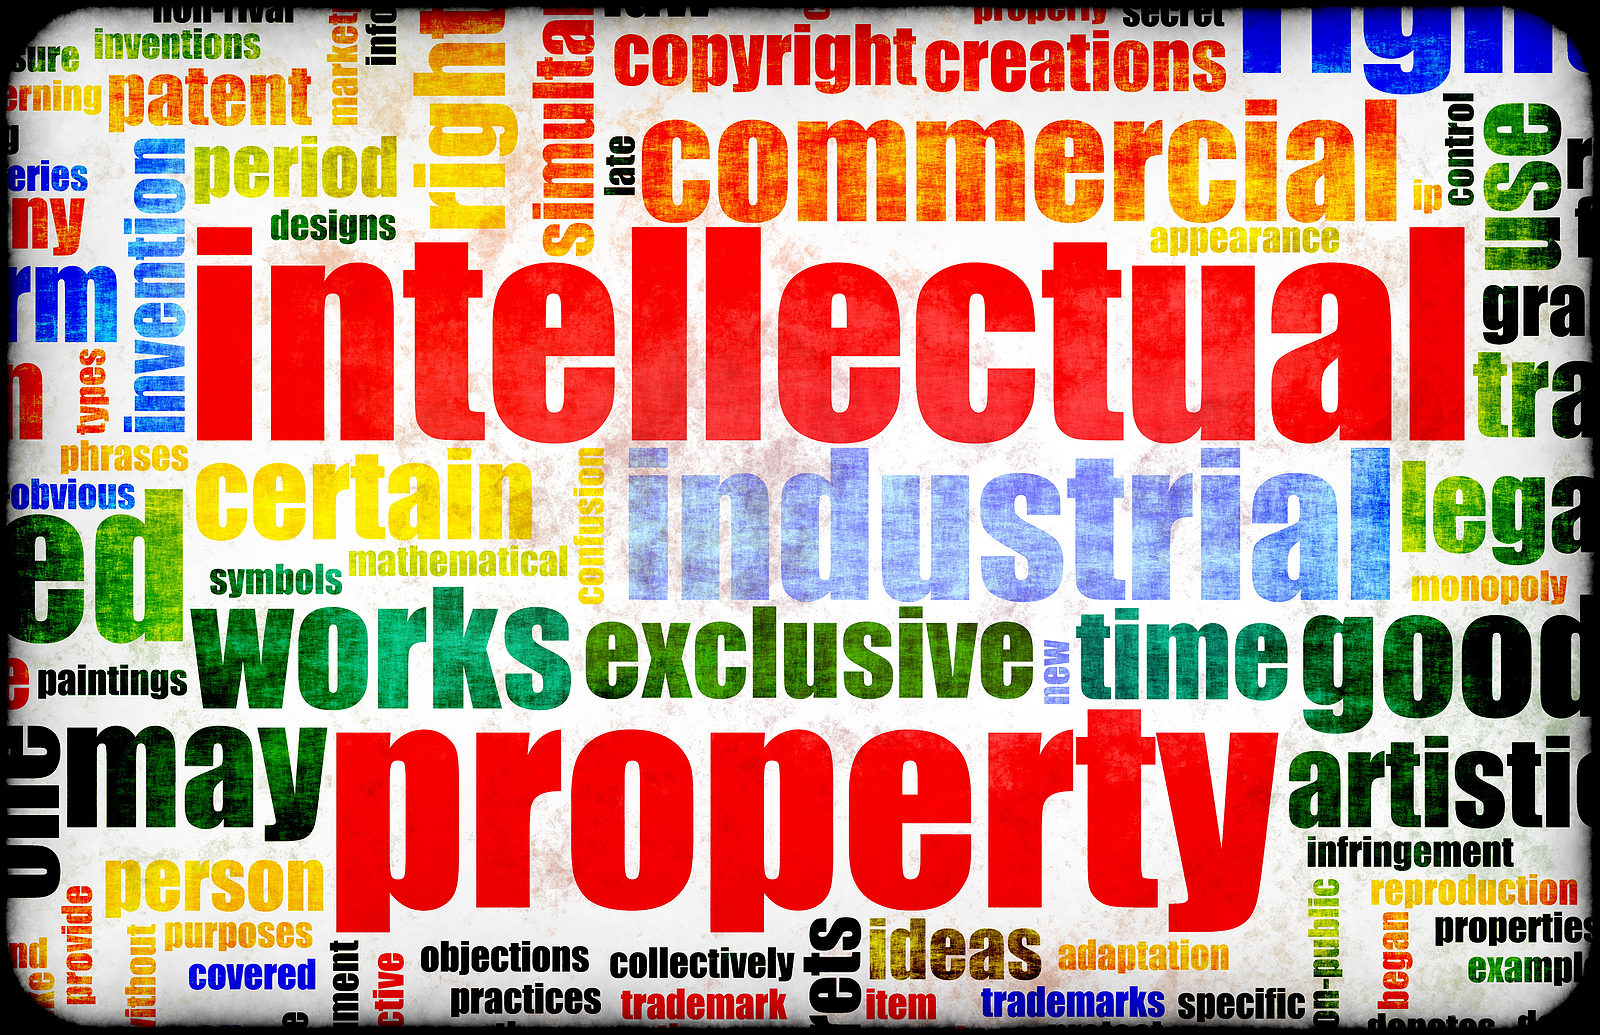 Social Media & The Law: 5 Hot Topics in 2012